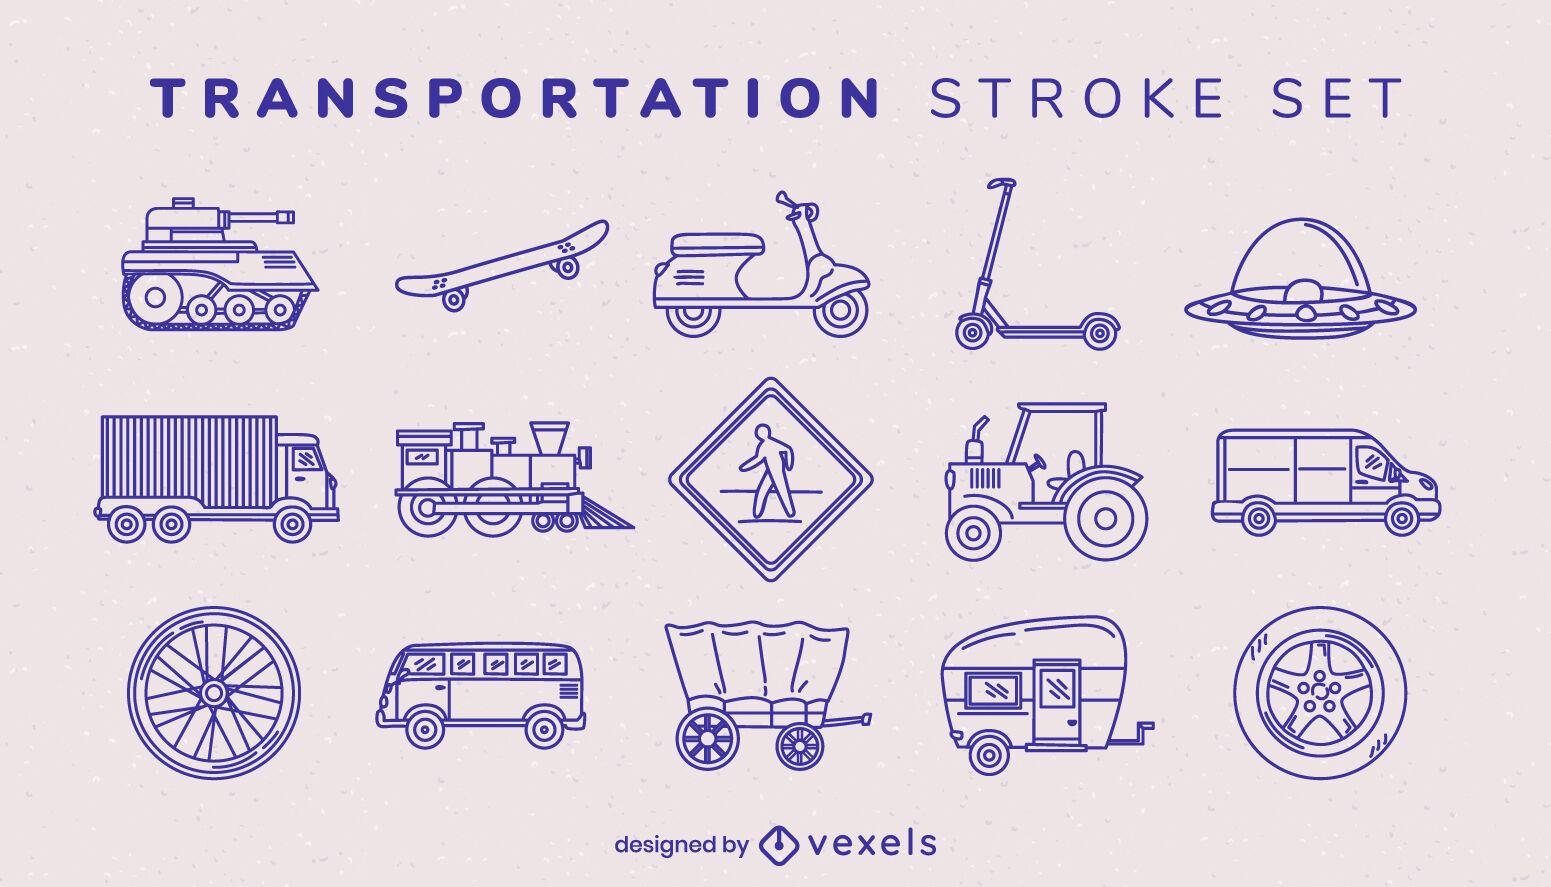 Transport items stroke set